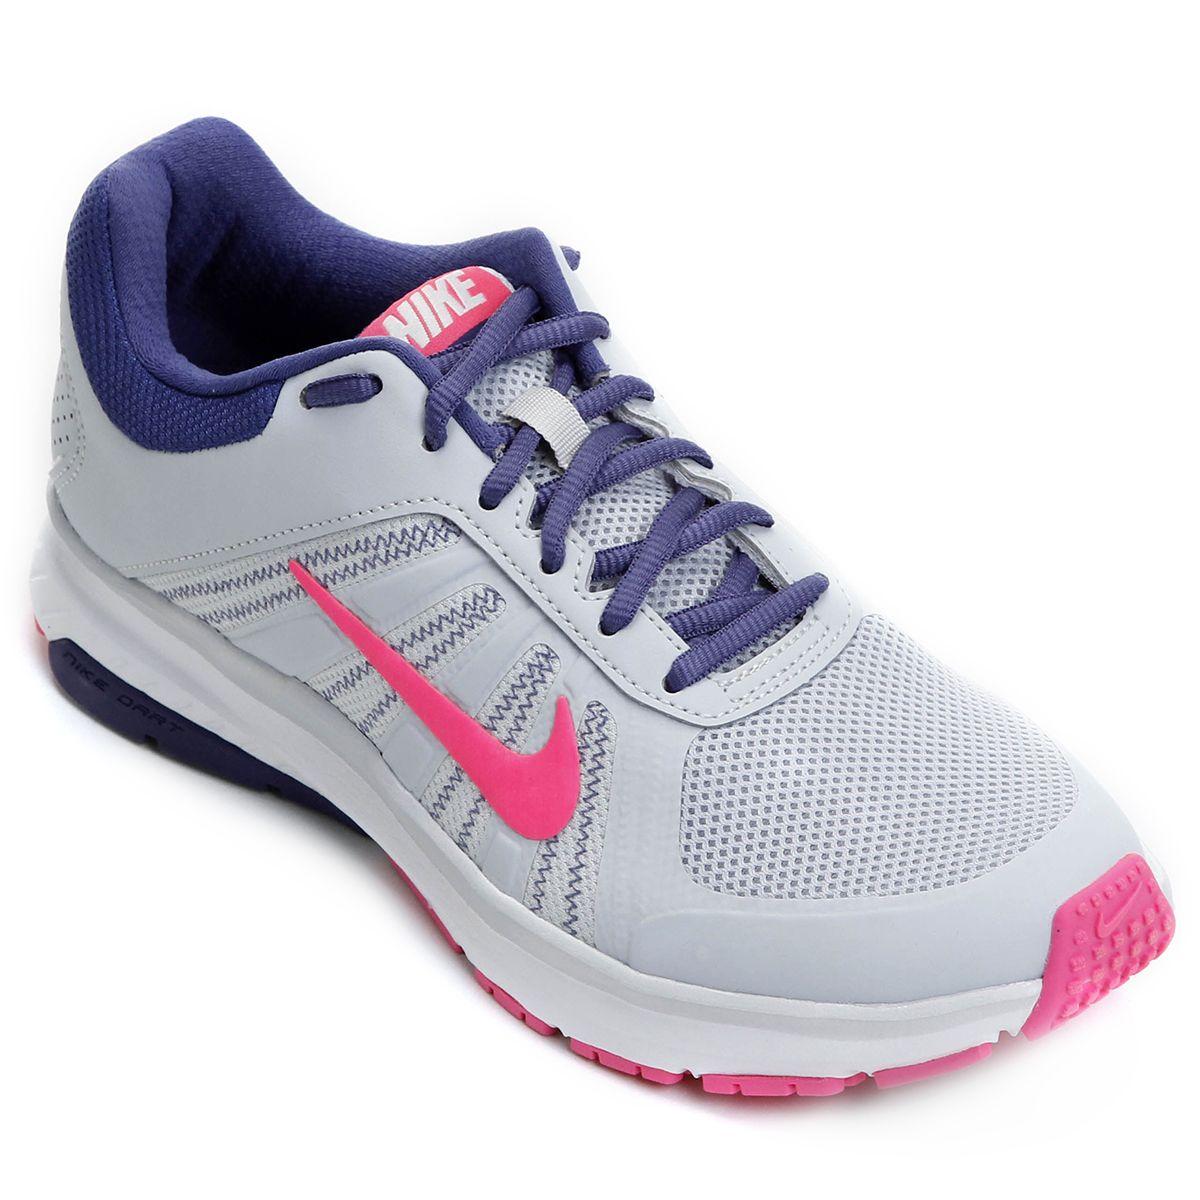 9b076f56725d8 Tênis Nike Dart 12 MSL Feminino - Cinza e Rosa